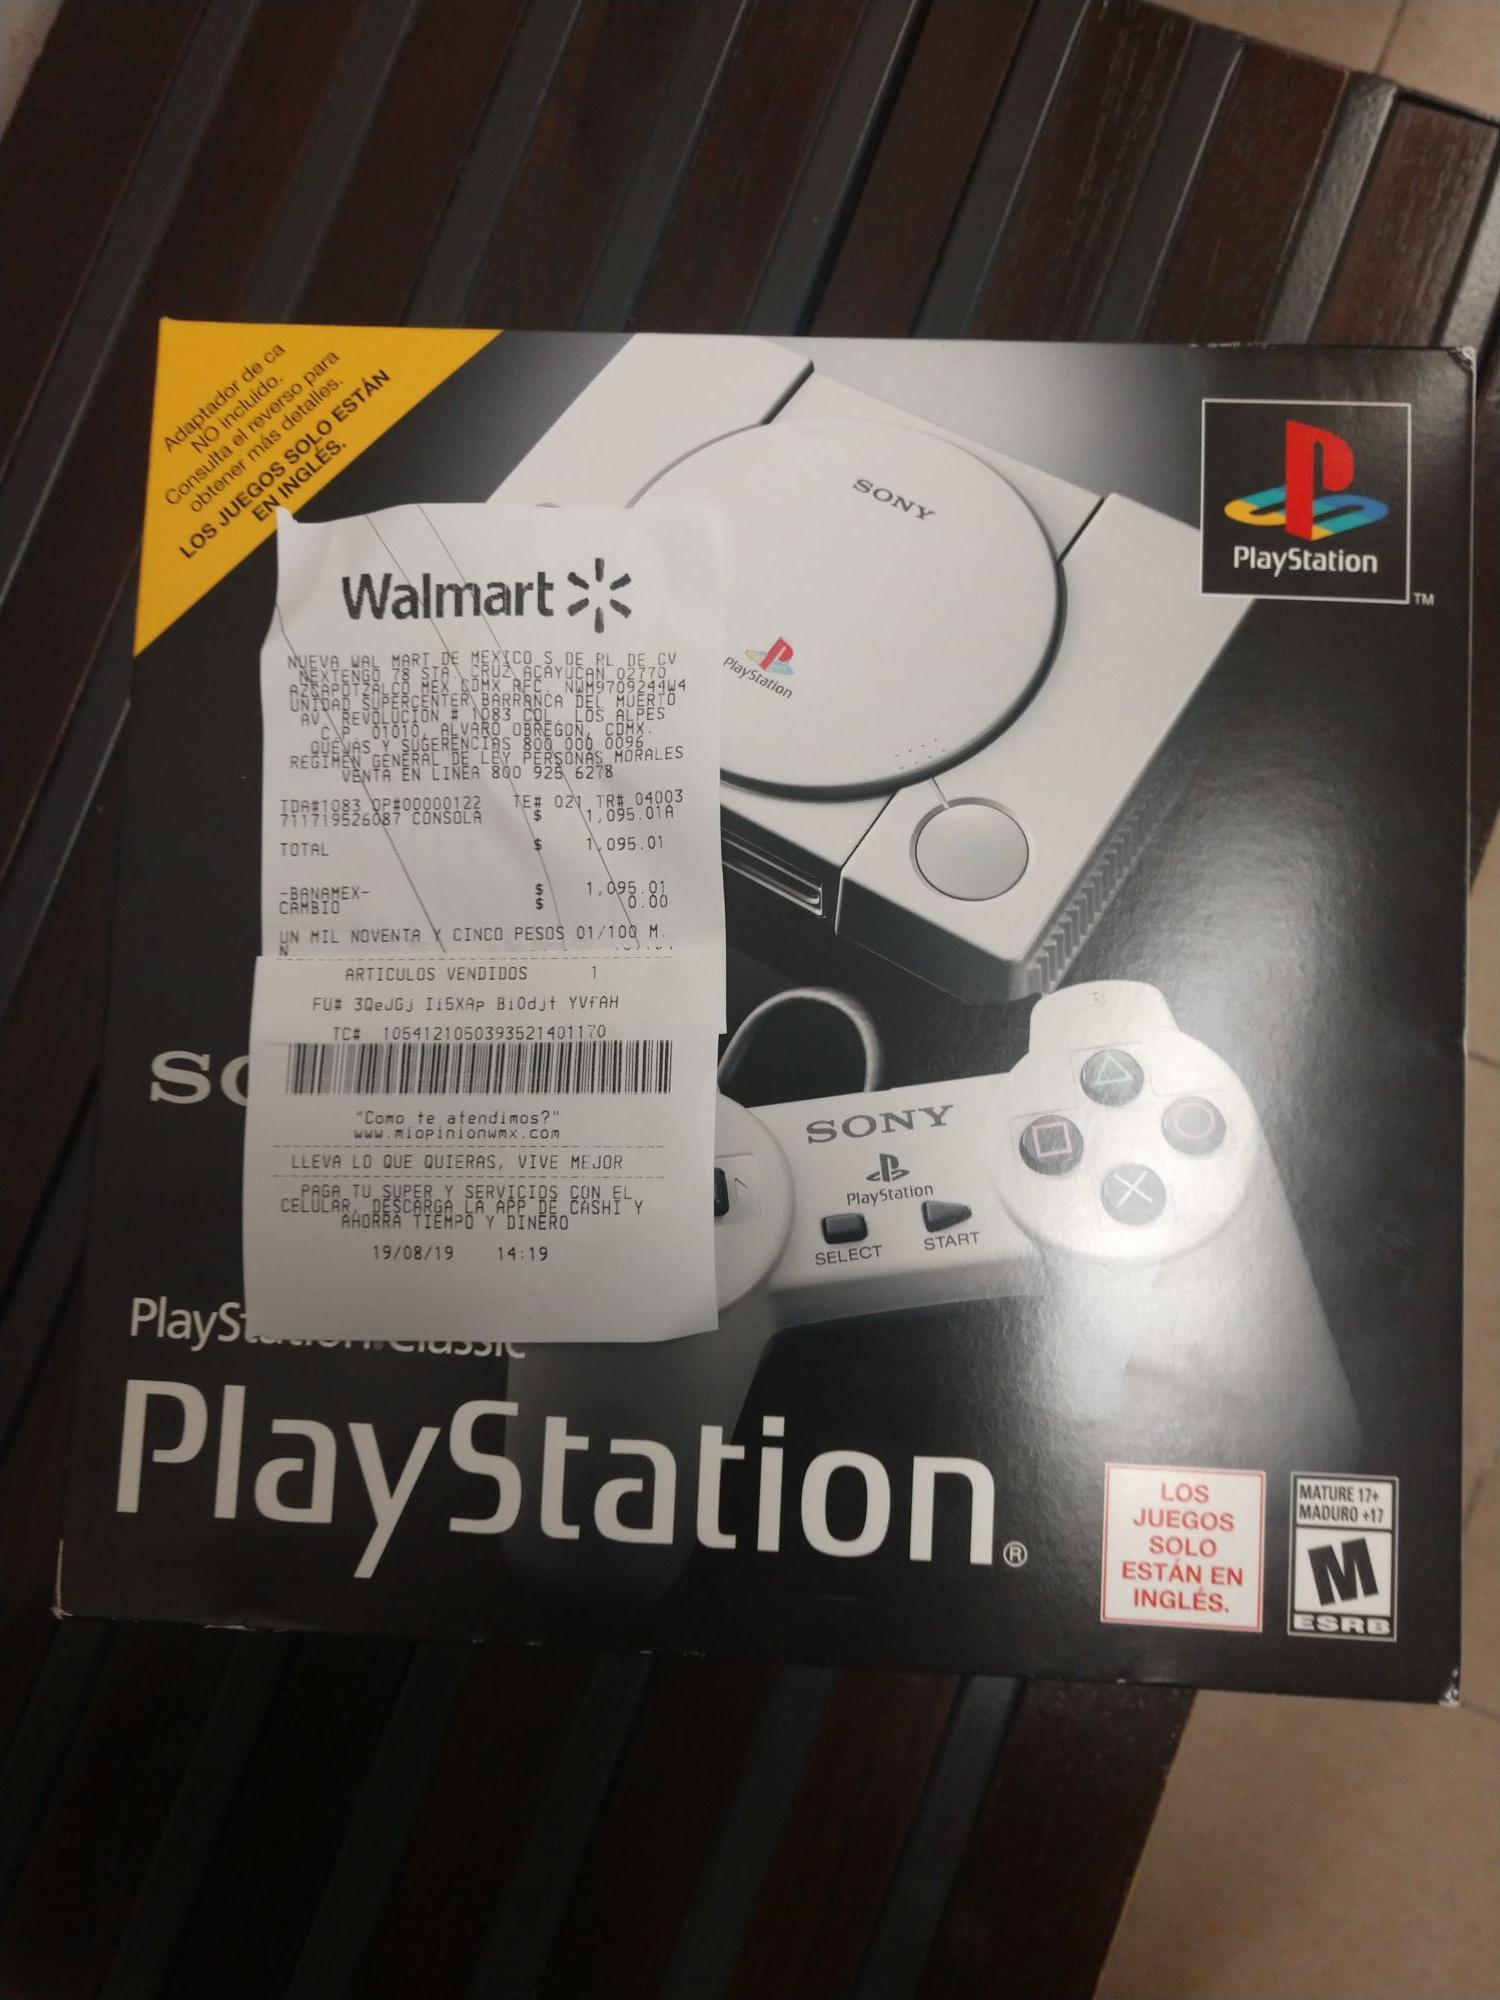 Walmart: Playstation classic